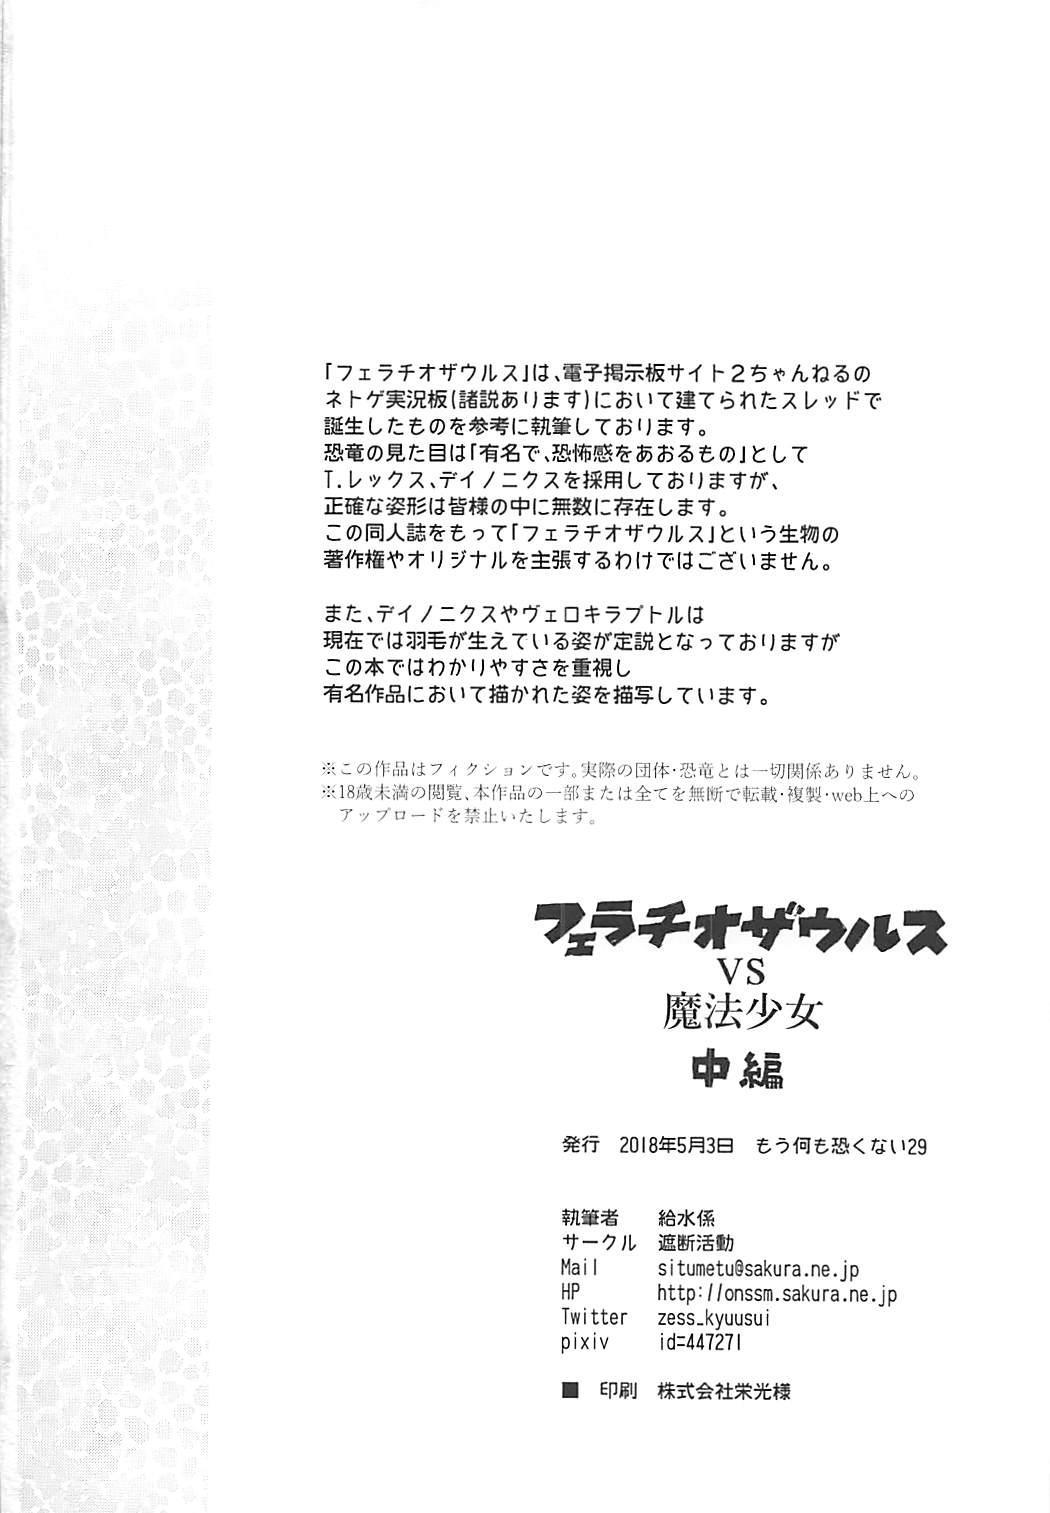 Fellatiosaurus VS Mahou Shoujo Chuuhen 28